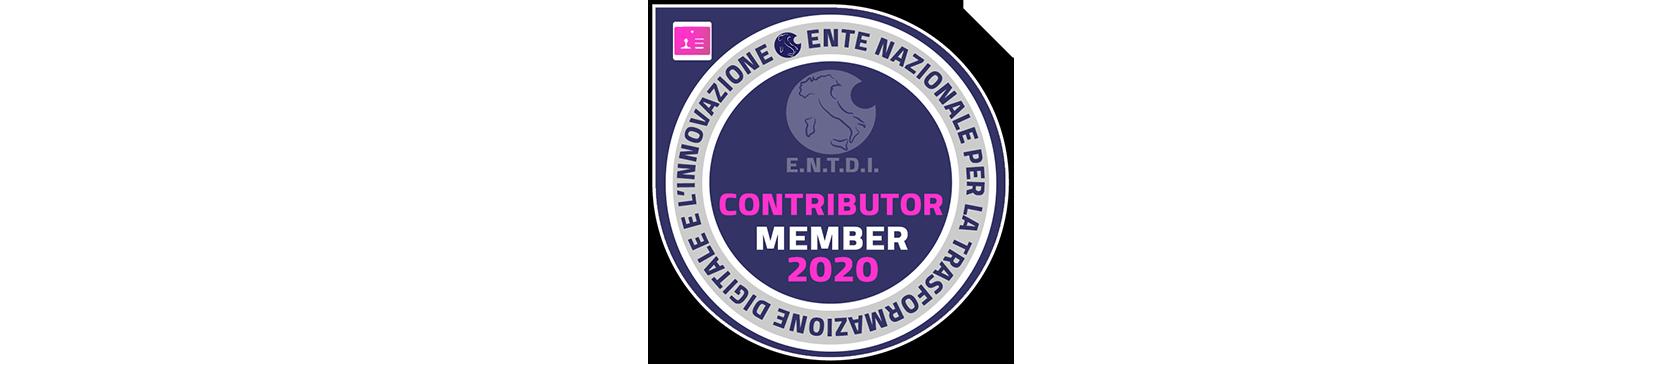 Contributor Member ENTD